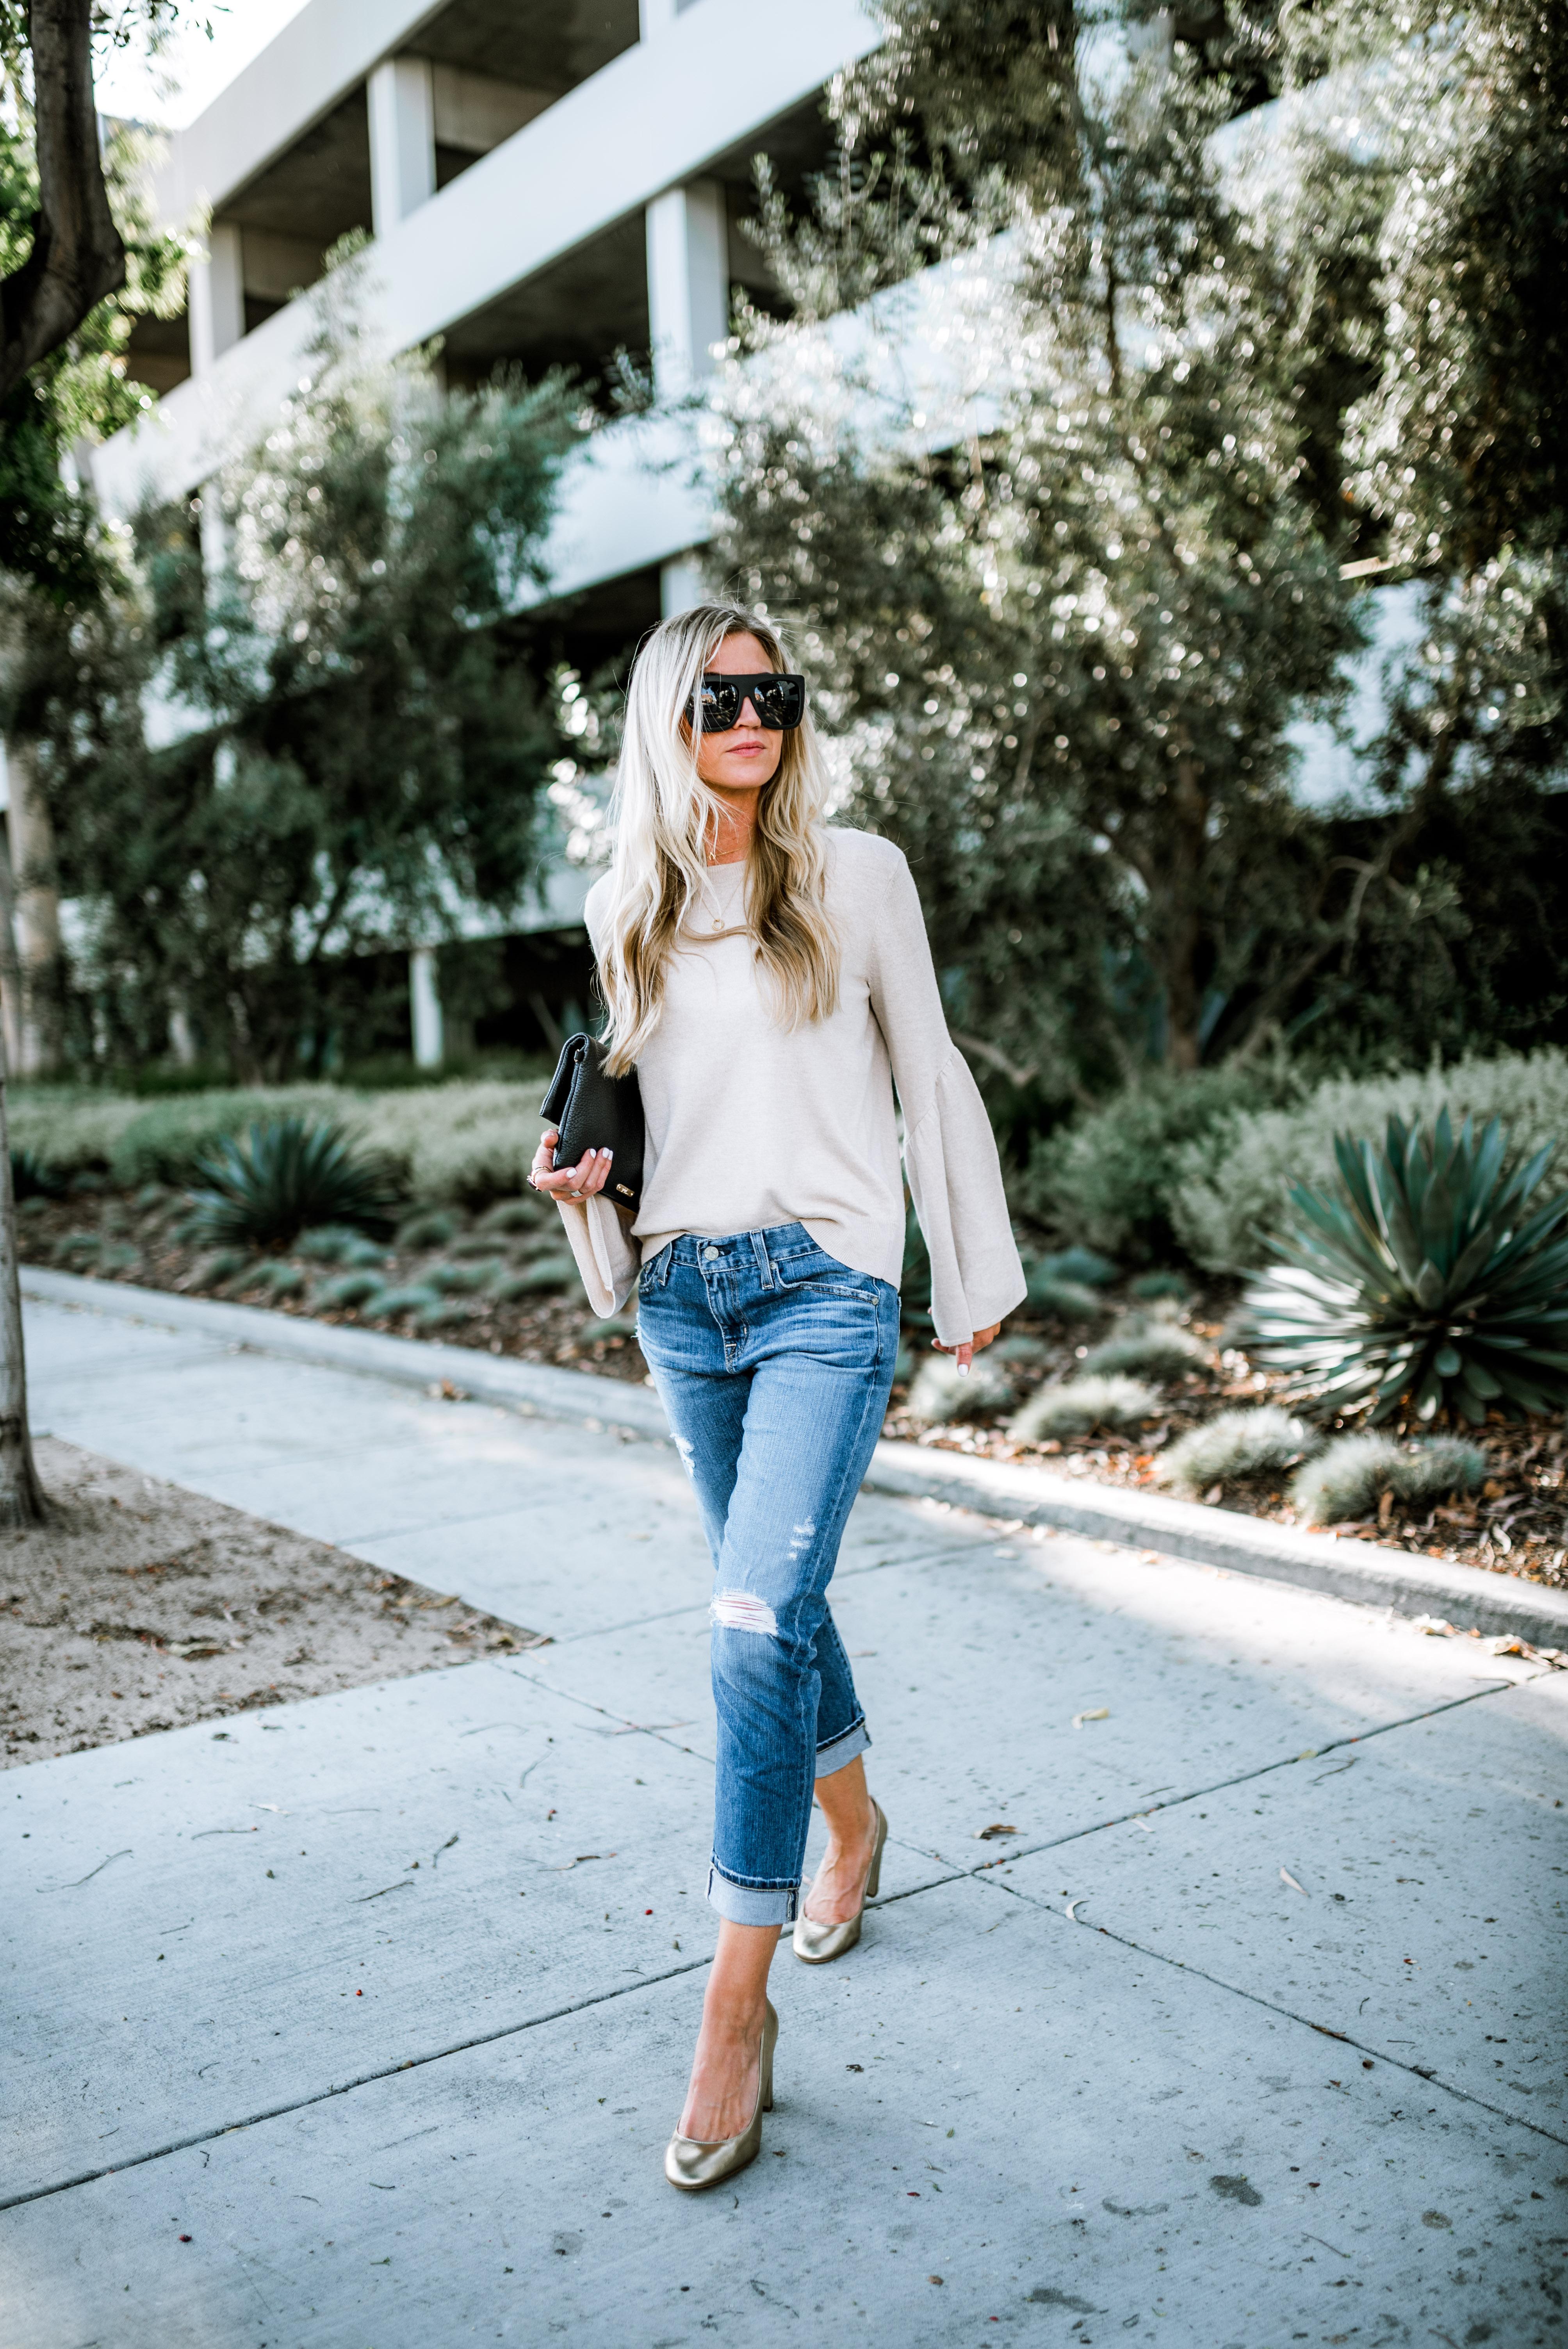 Camel bell sleeved sweater + gold heels.